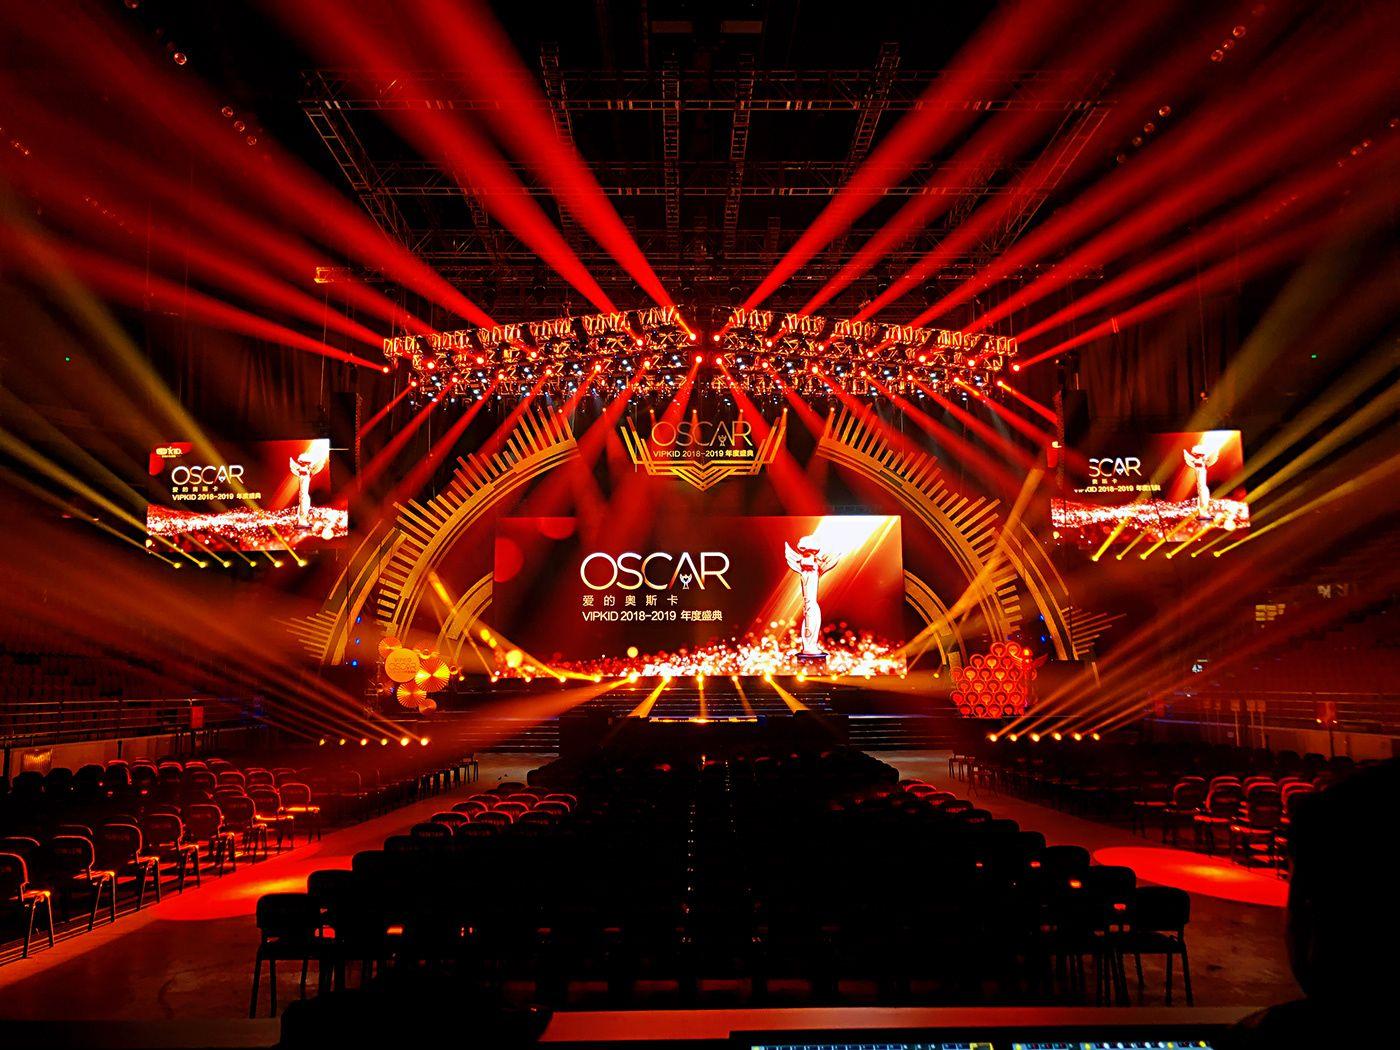 Https Www Behance Net Gallery 75127669 26 Stage Lighting Design Concert Stage Design Stage Set Design